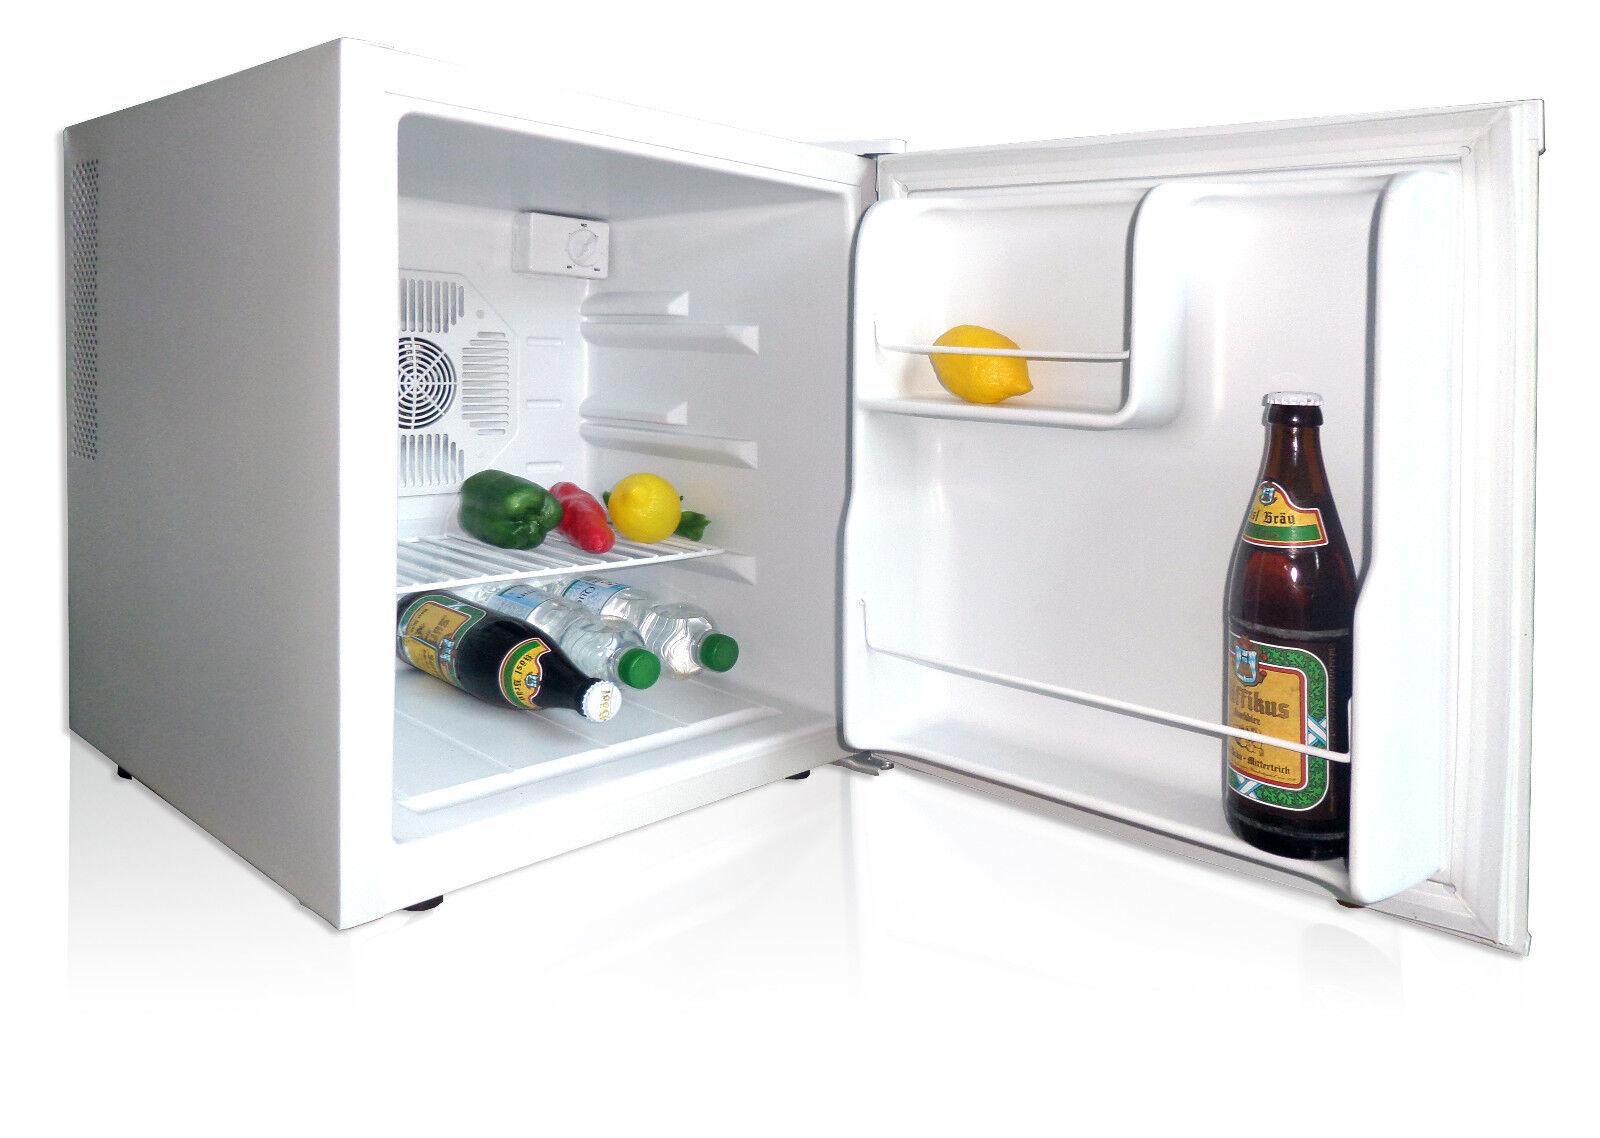 Mini Kühlschrank Liebherr : Kühlschrank mit gefrierfach test liebherr kühlschrank ohne